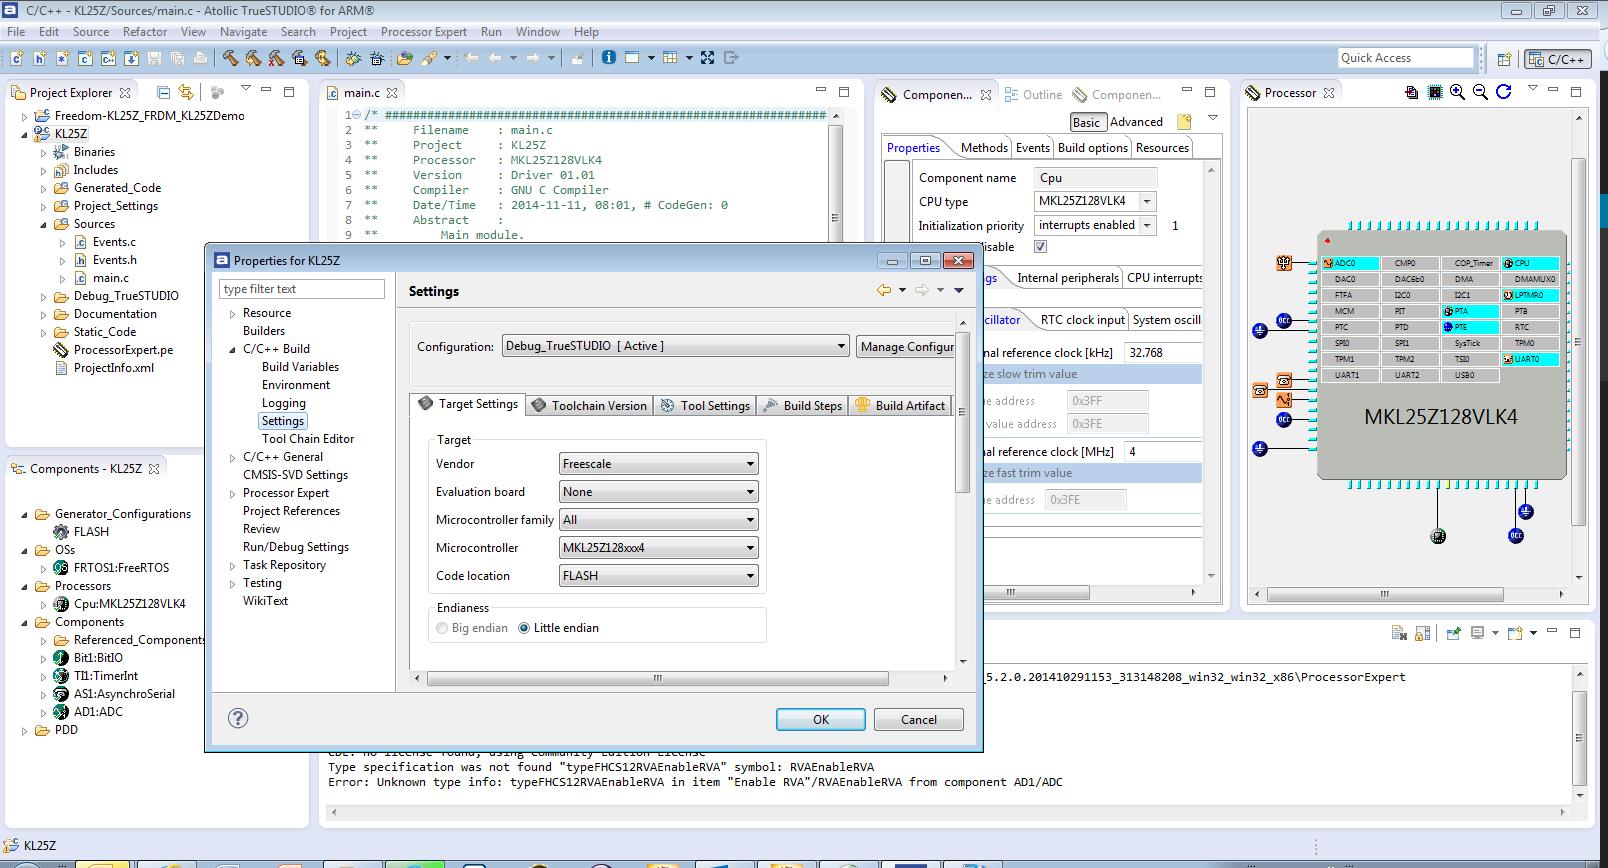 Adding Processor Expert to Atollic TrueSTUDIO - DZone Java